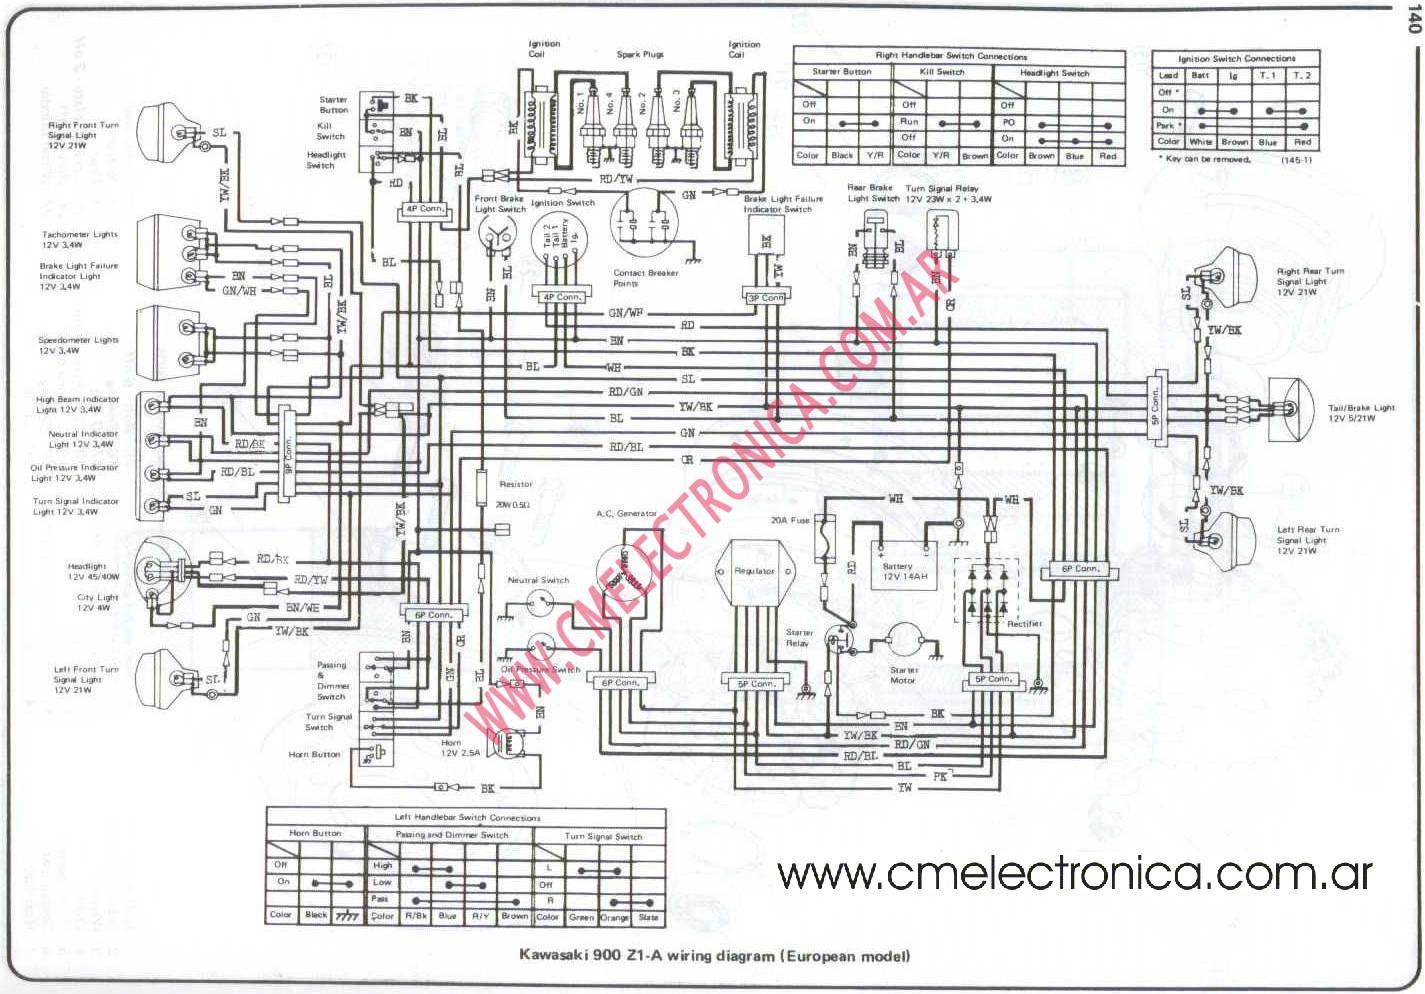 Diagrama Kawasaki Z1a 900